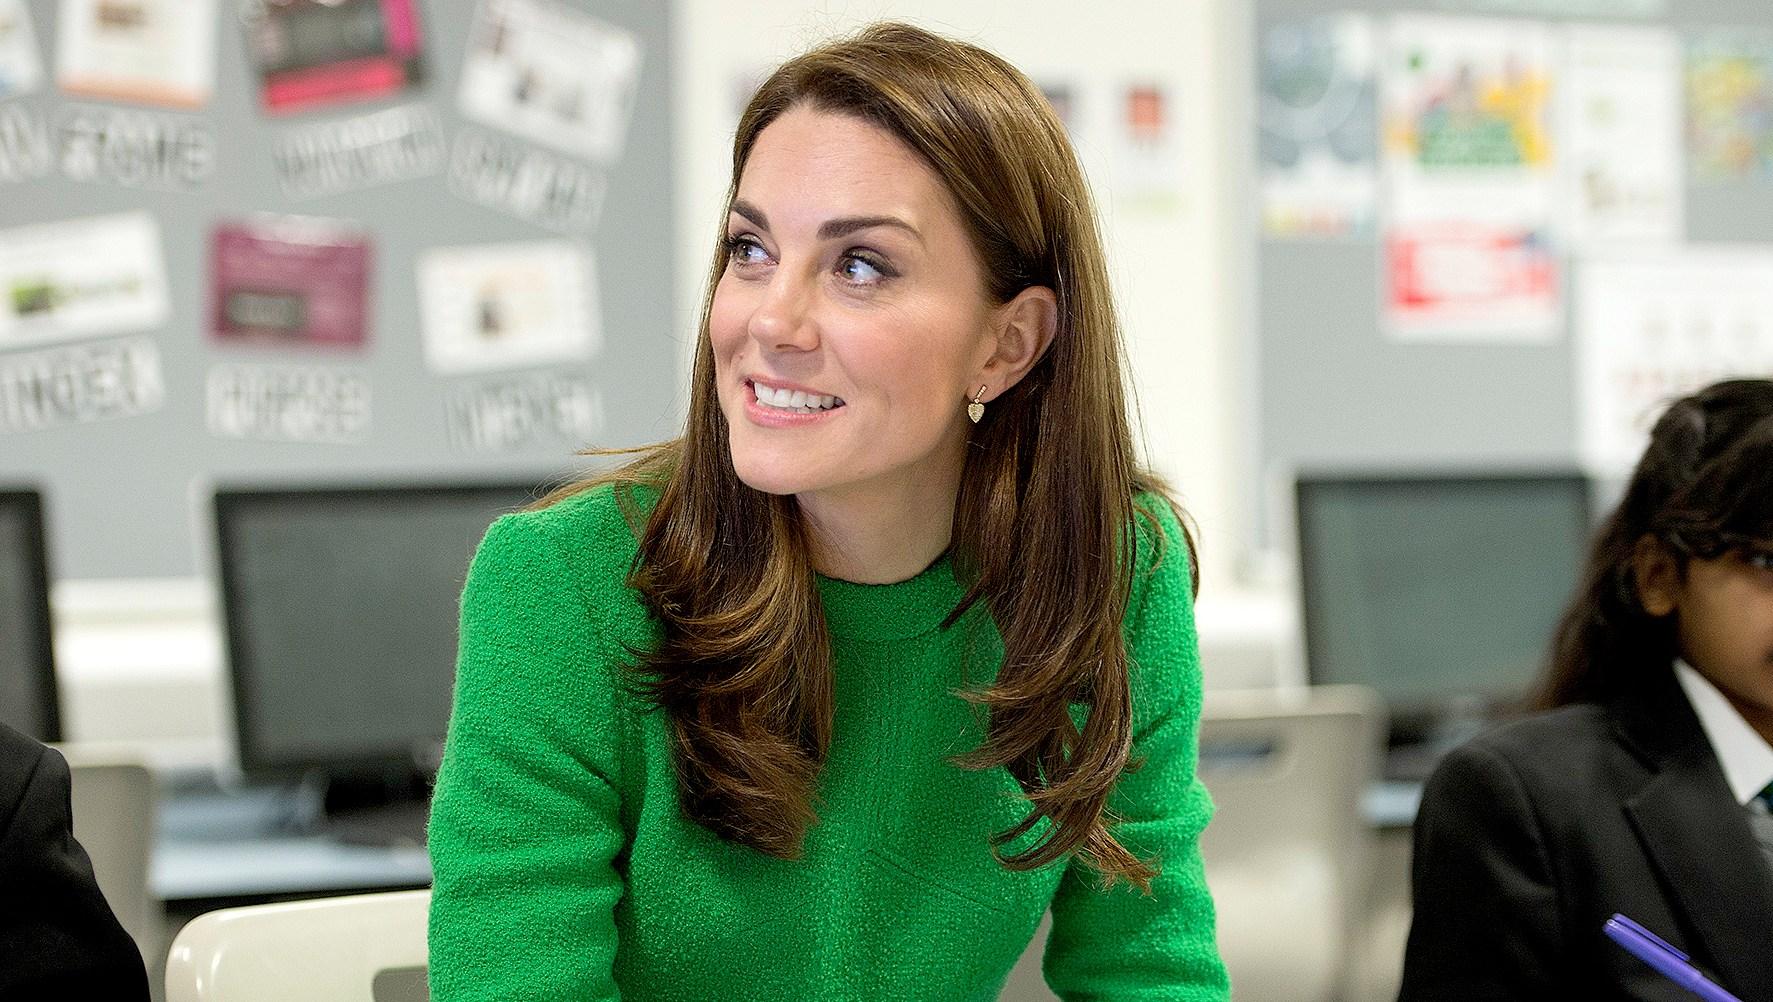 Duchess-of-Cambridge-lavendar-primary-school